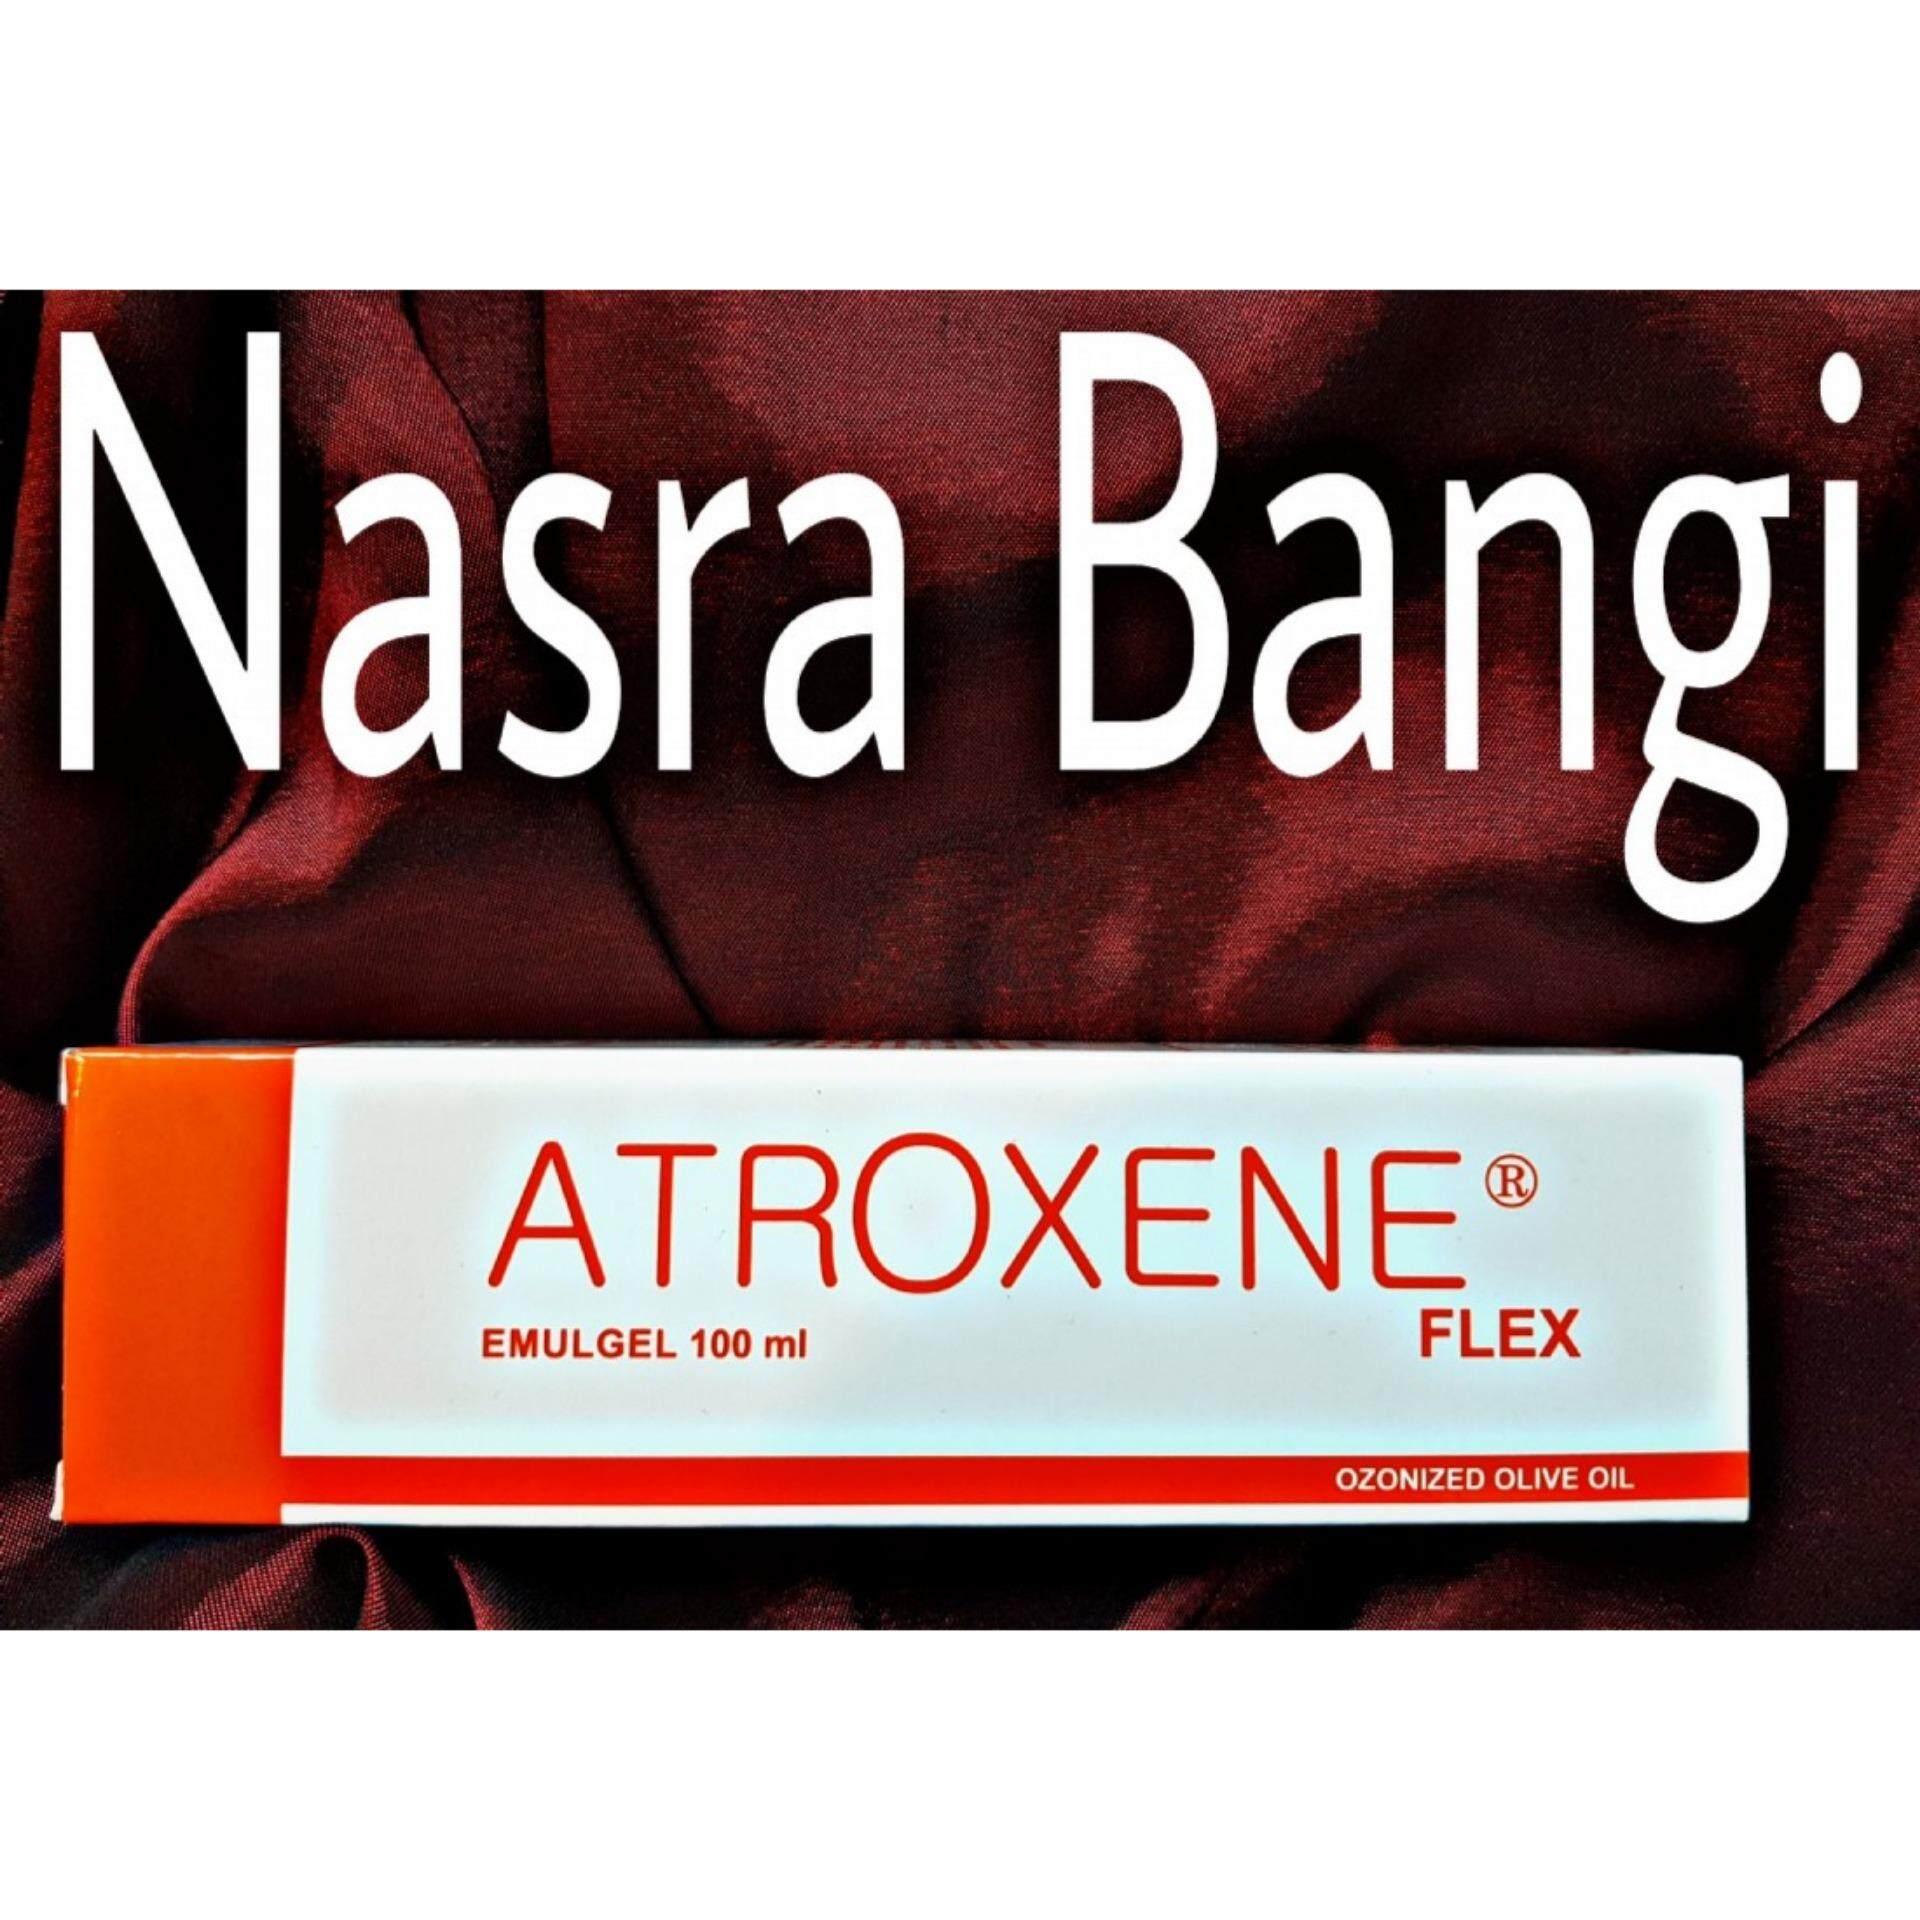 Cek Harga Woodwards Gripe Water 148ml Exp 04 19 Terbaru Atroxene Flex Emulgel 100ml Farmasi Nasra Bangi 2020